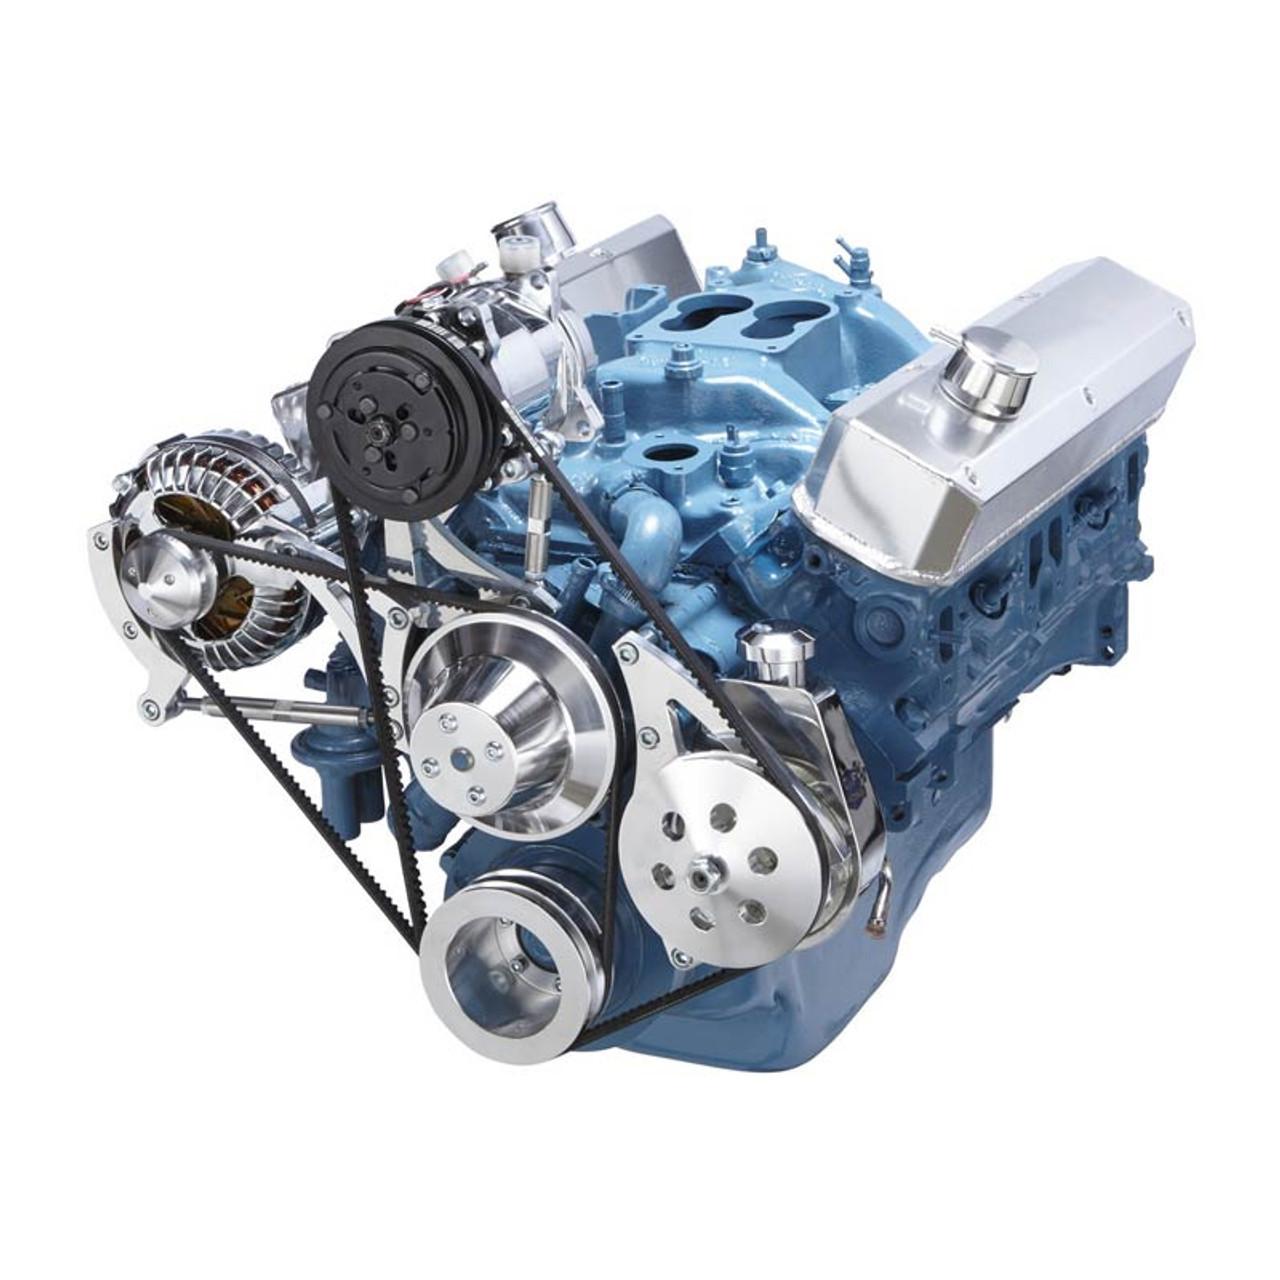 chrysler small block air conditioning system 318 340 360 rh cvfracing com